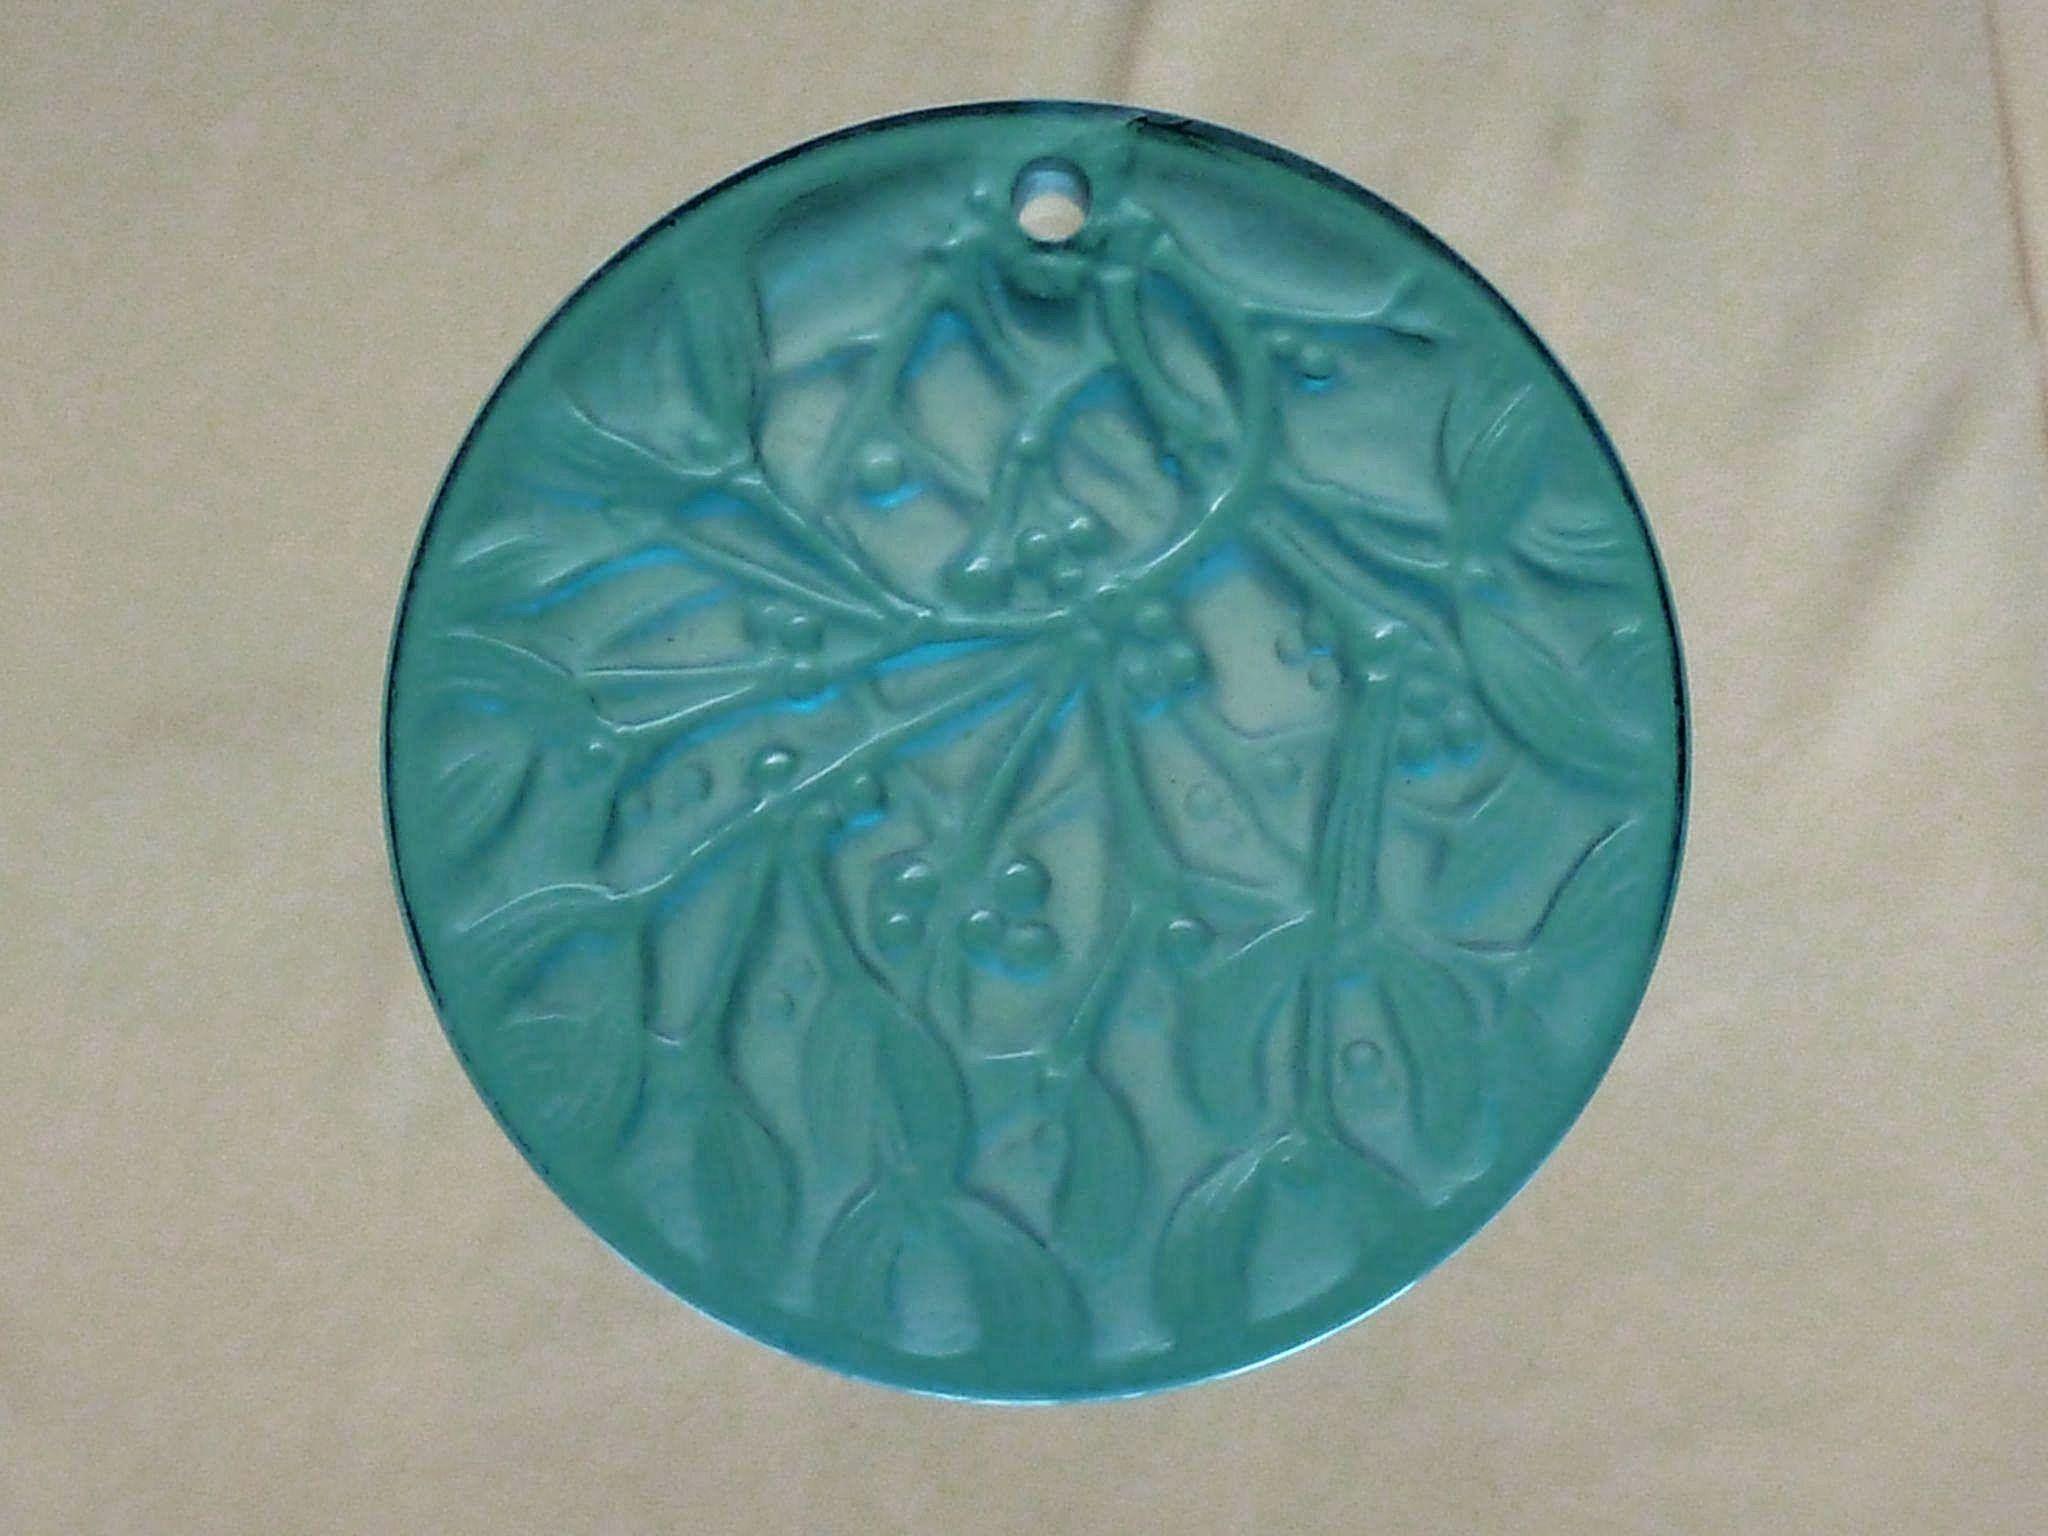 Noel 1989 Blue Glass Lalique Mistletoe Christmas Ornament